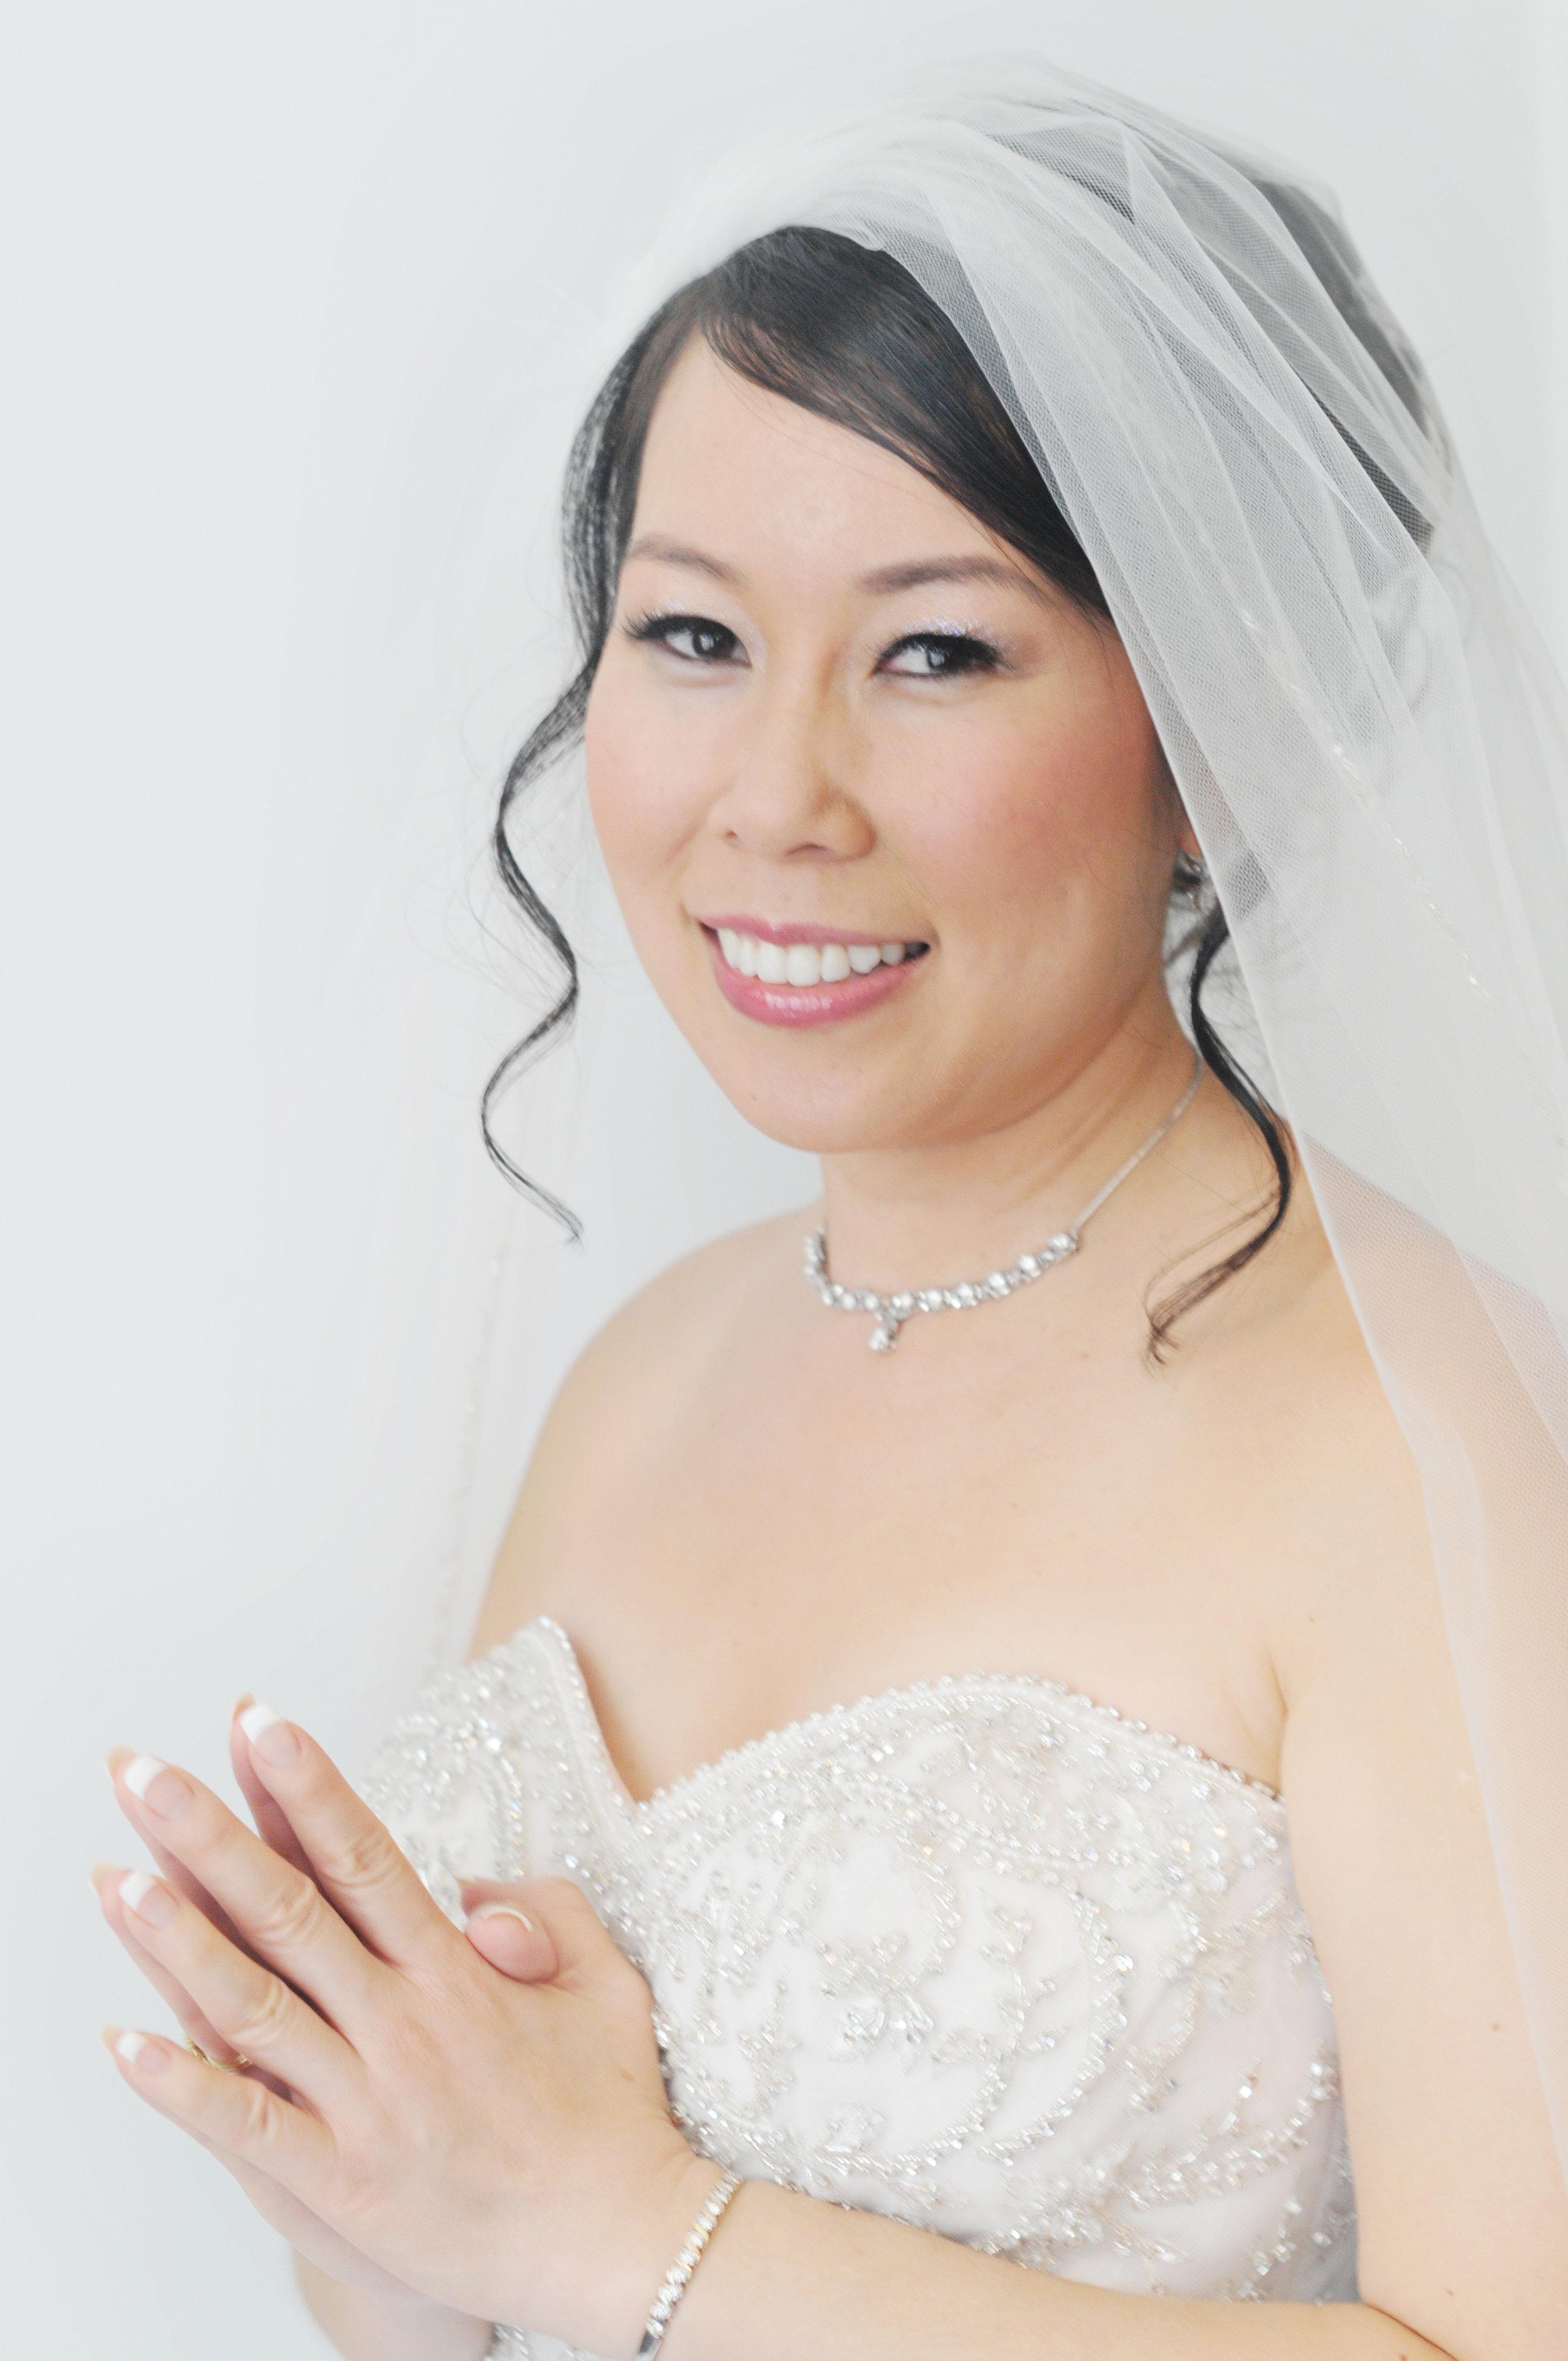 Partovi Wedding 2177 by maria pablo.jpg